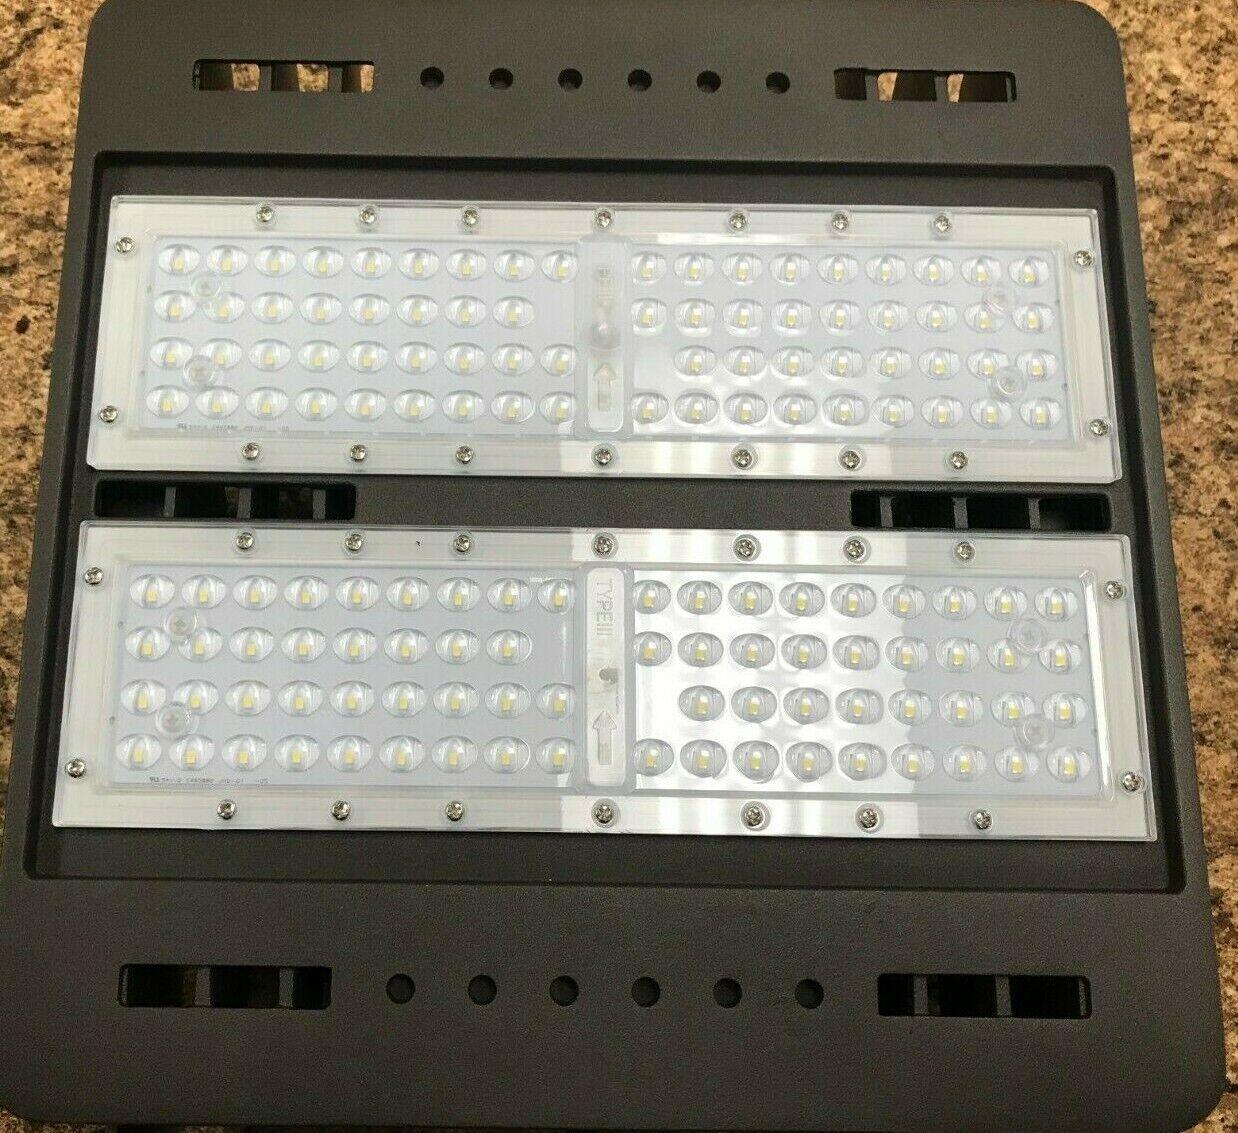 LED 150 WATTS FLOOD LIGHT WALL MOUNT 5000K UL LISTED 17,904 LUMENS(DIMMABLE)